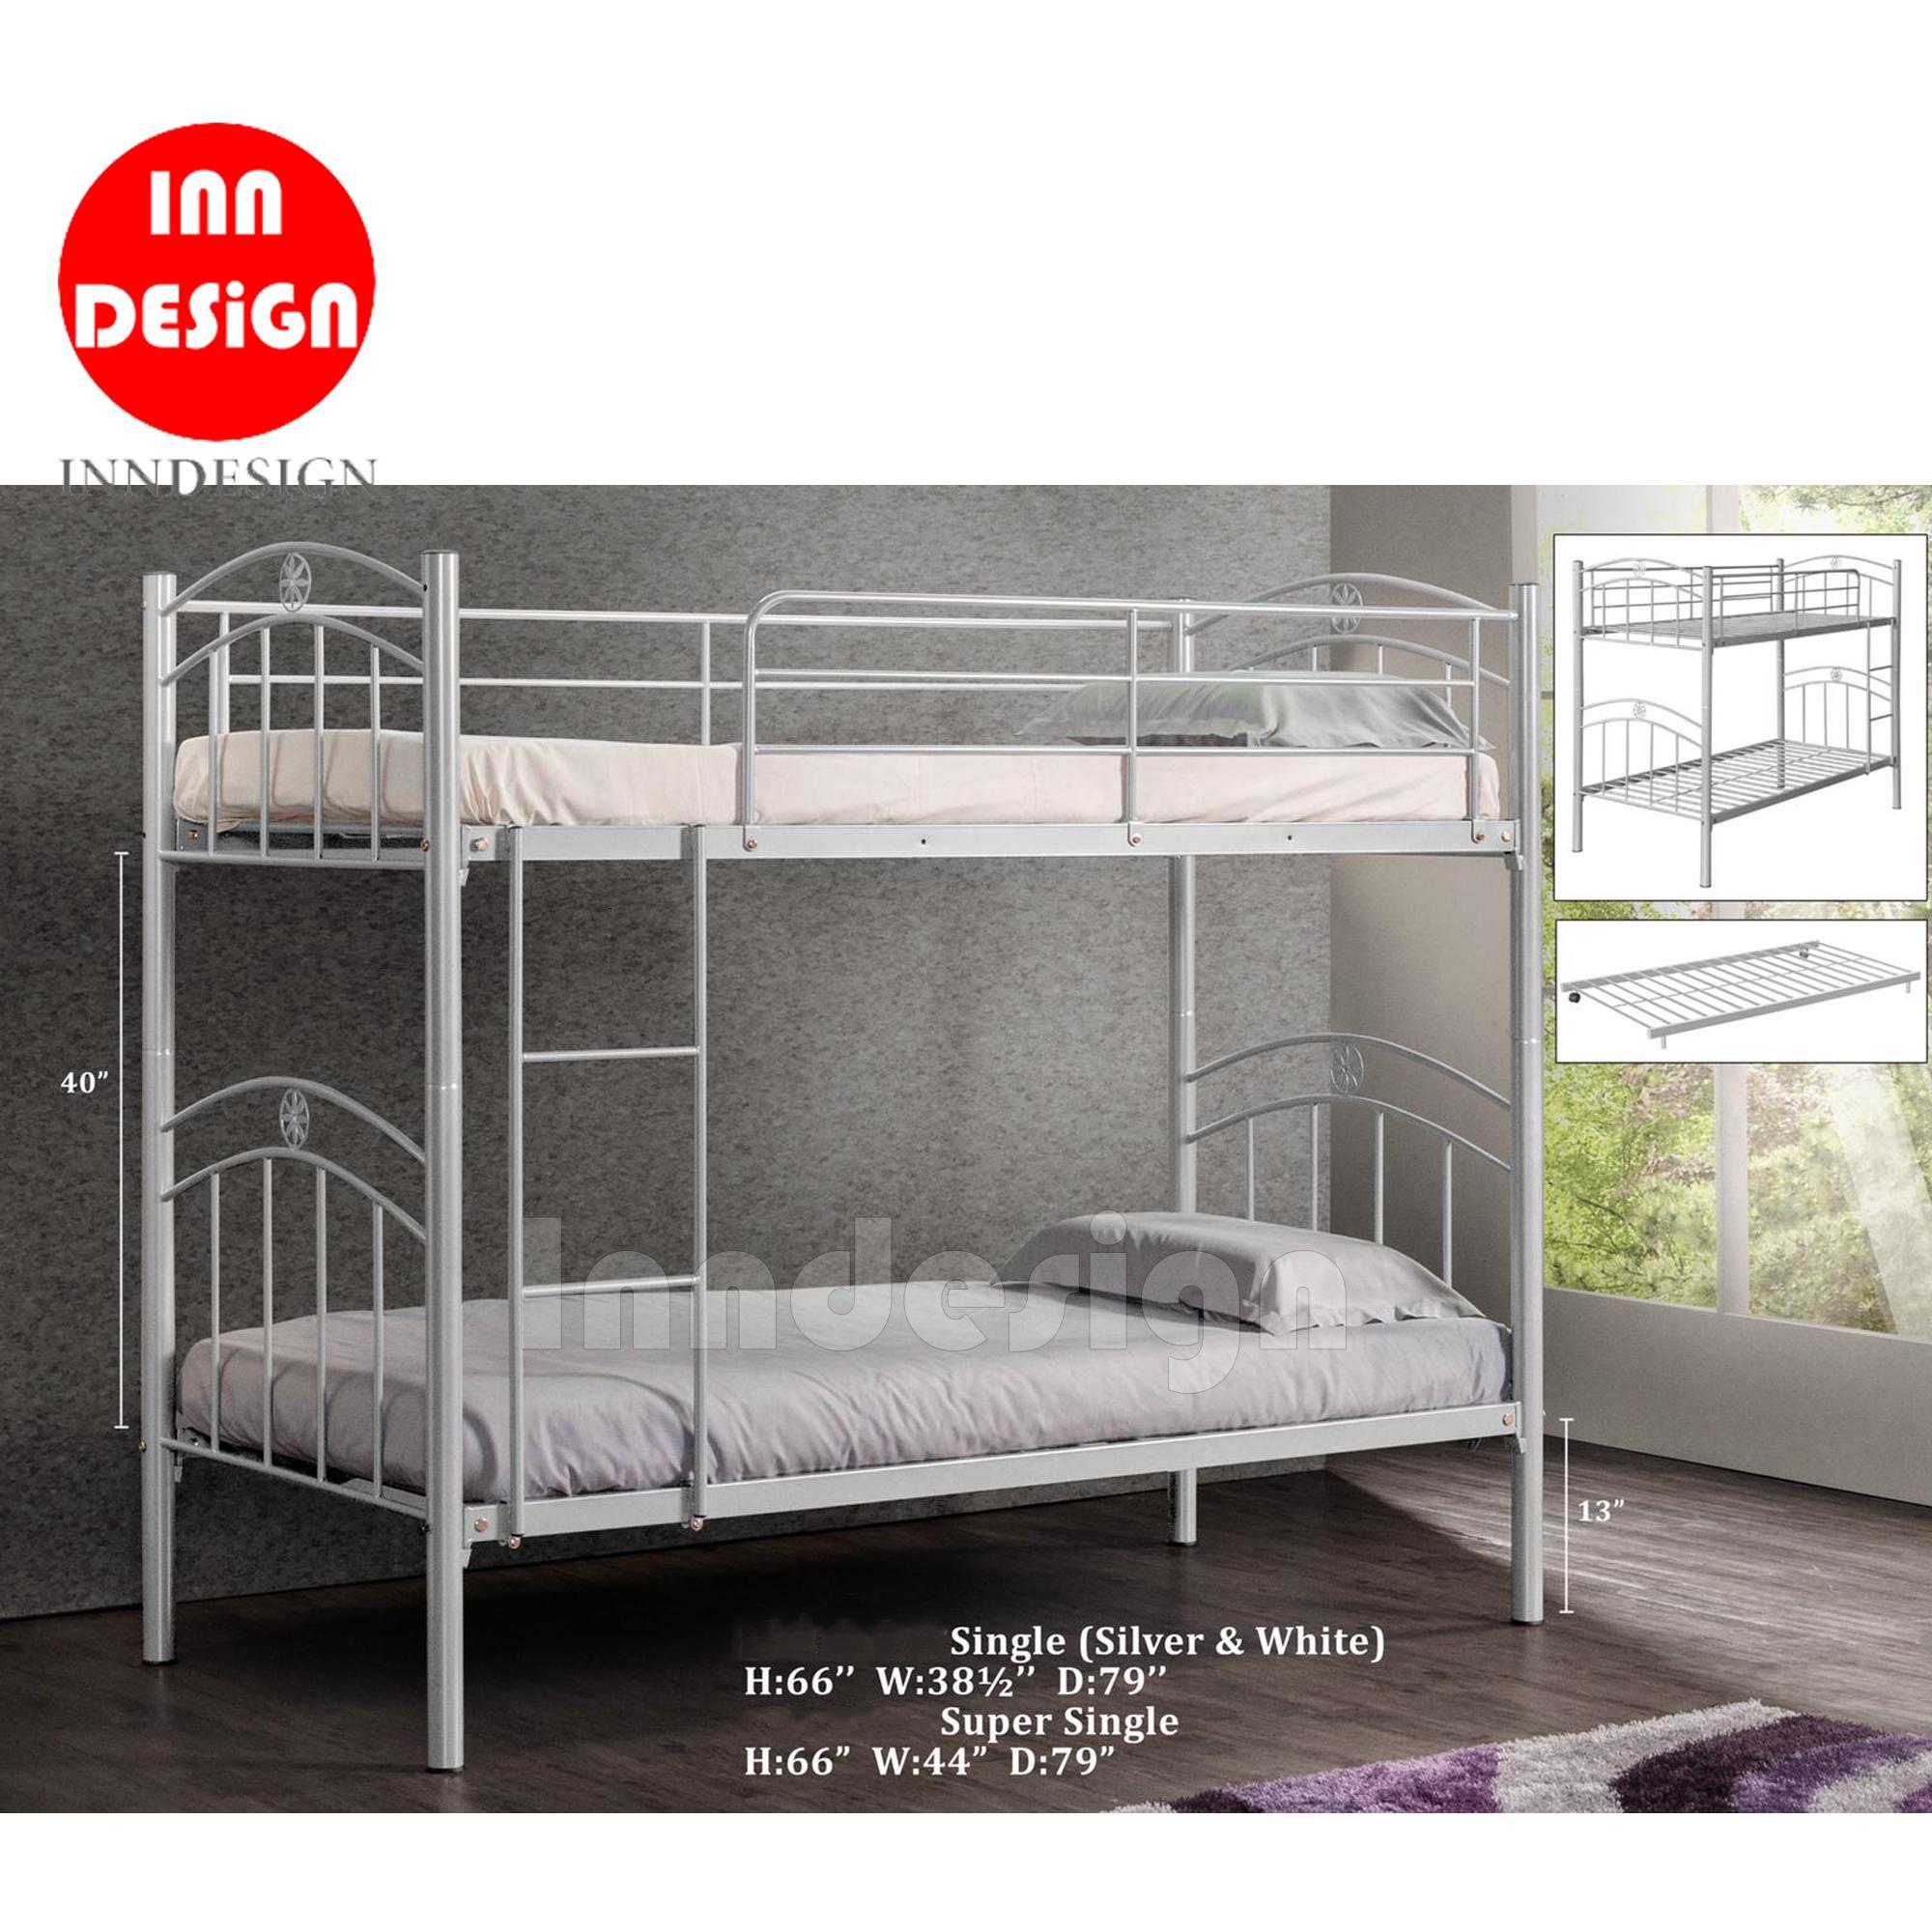 [1 YEAR WARRANTY] Double Deck Bed Single Metal Bed / Super Single Metal Bed / Metal Bed Frame (Silver)